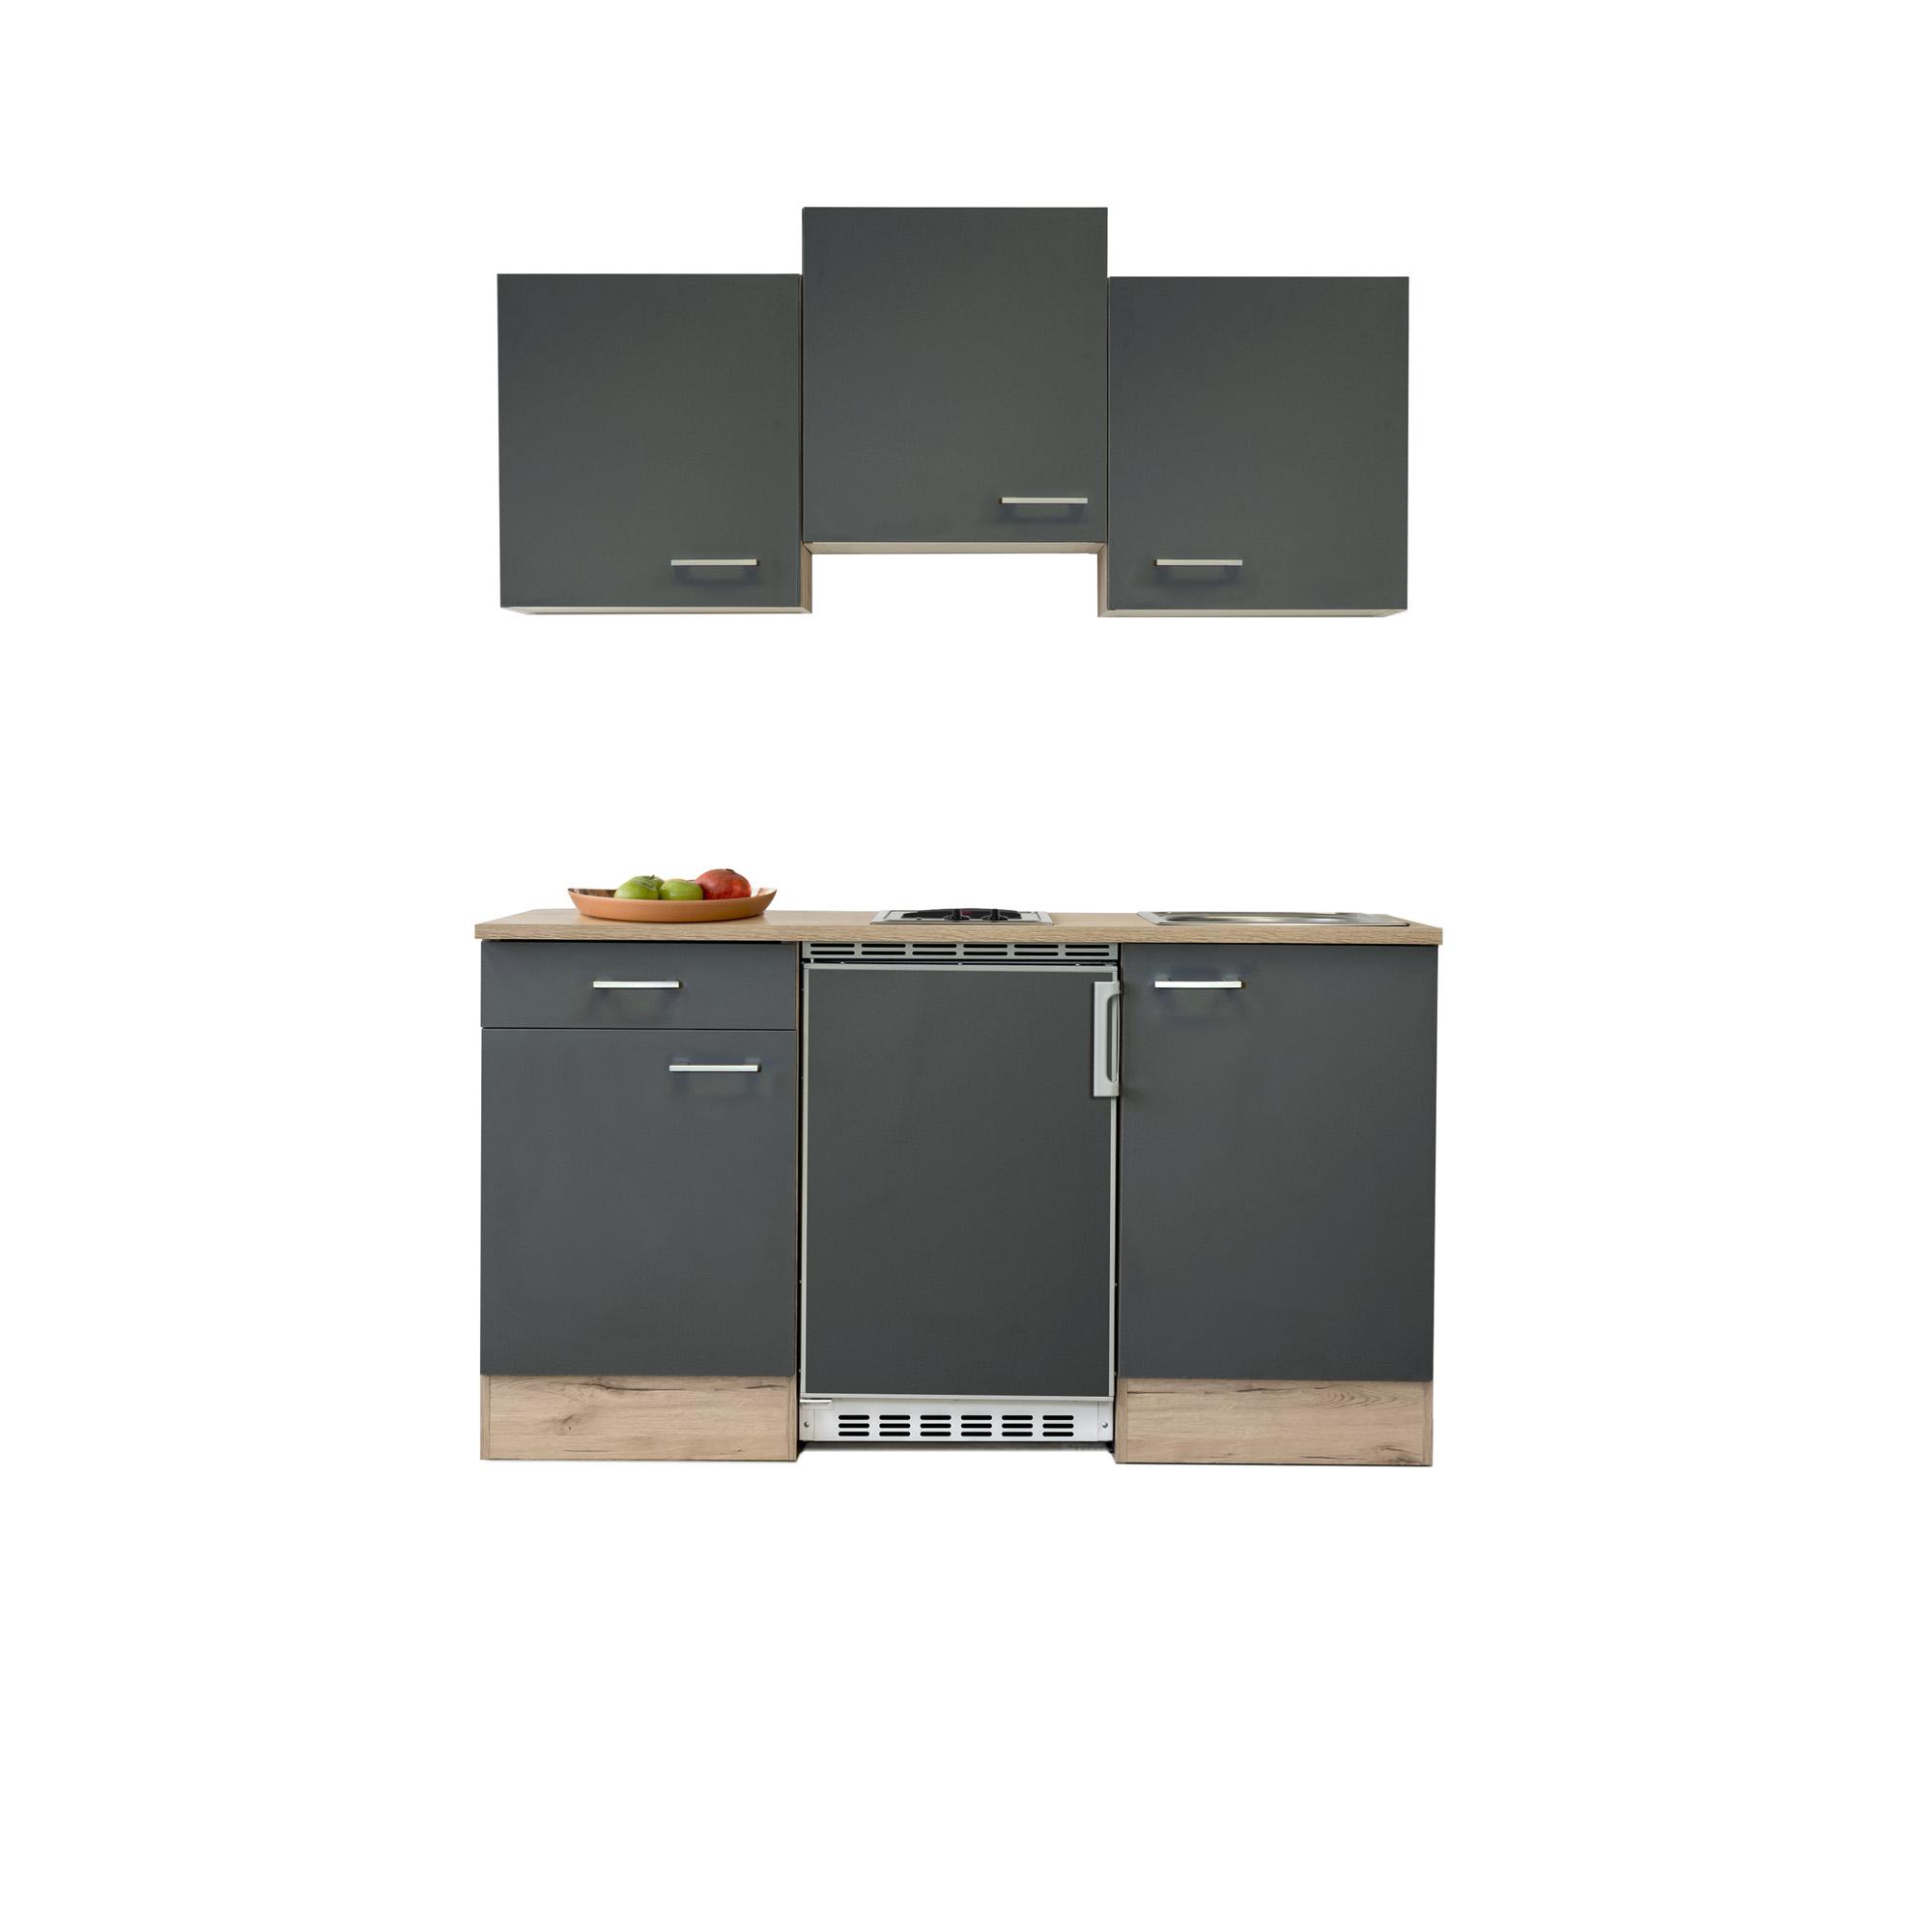 Full Size of Büro Küchenzeile Einfache Büro Küche Coole Büro Küche Büroküche Ebay Kleinanzeigen Küche Büroküche